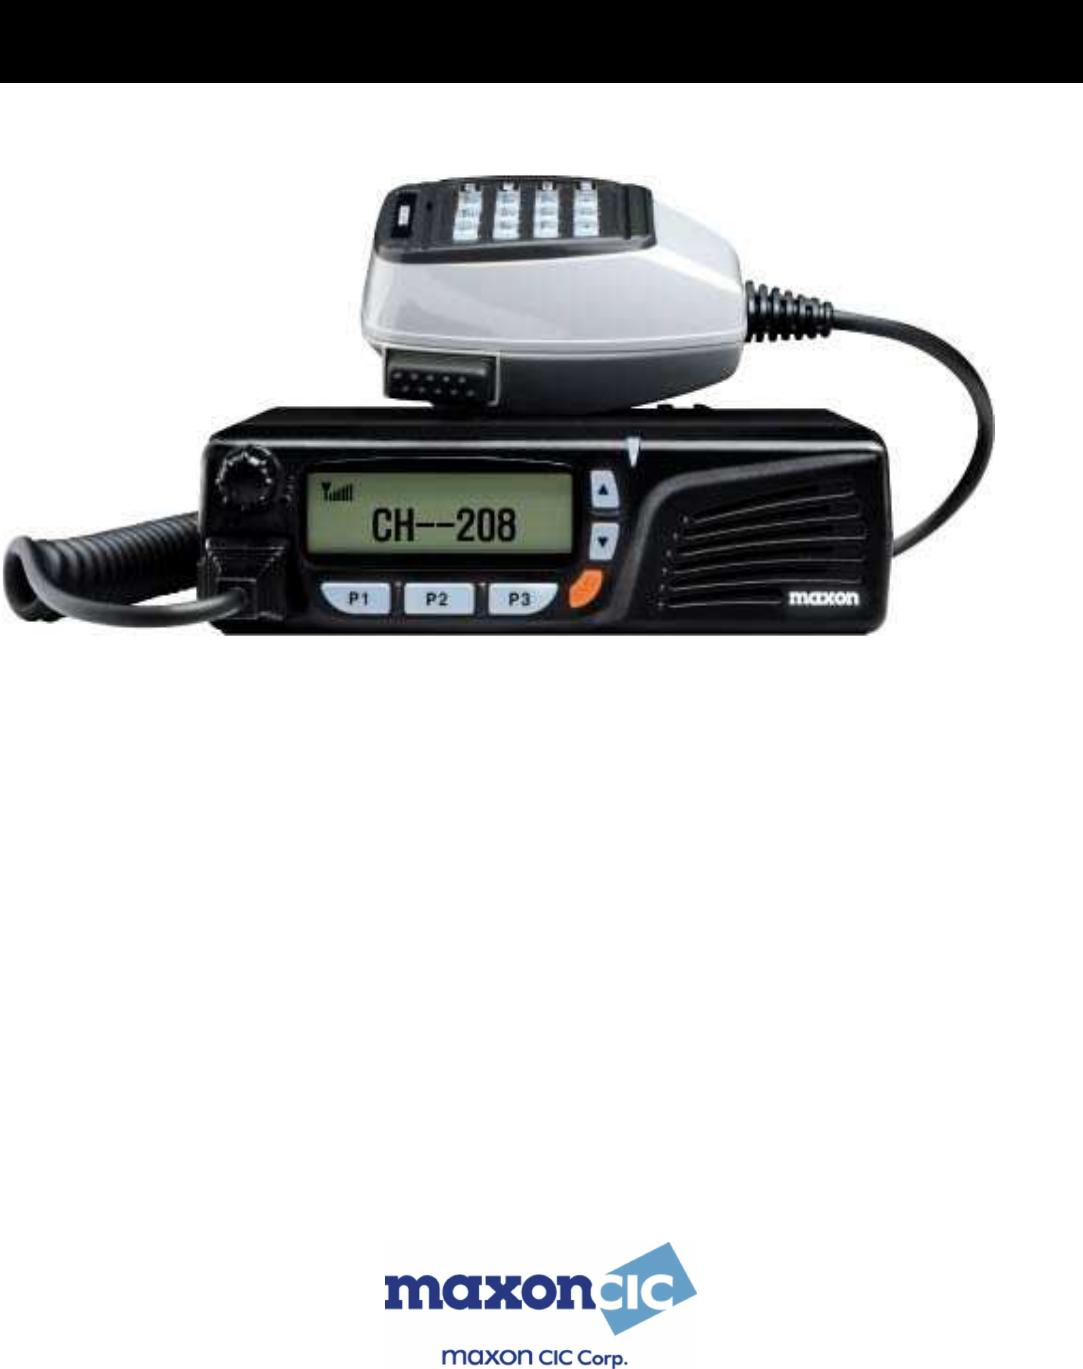 maxon microphone wiring diagram maxon cic sm5102 two way vhf lmr user manual sm5102 manual  maxon cic sm5102 two way vhf lmr user